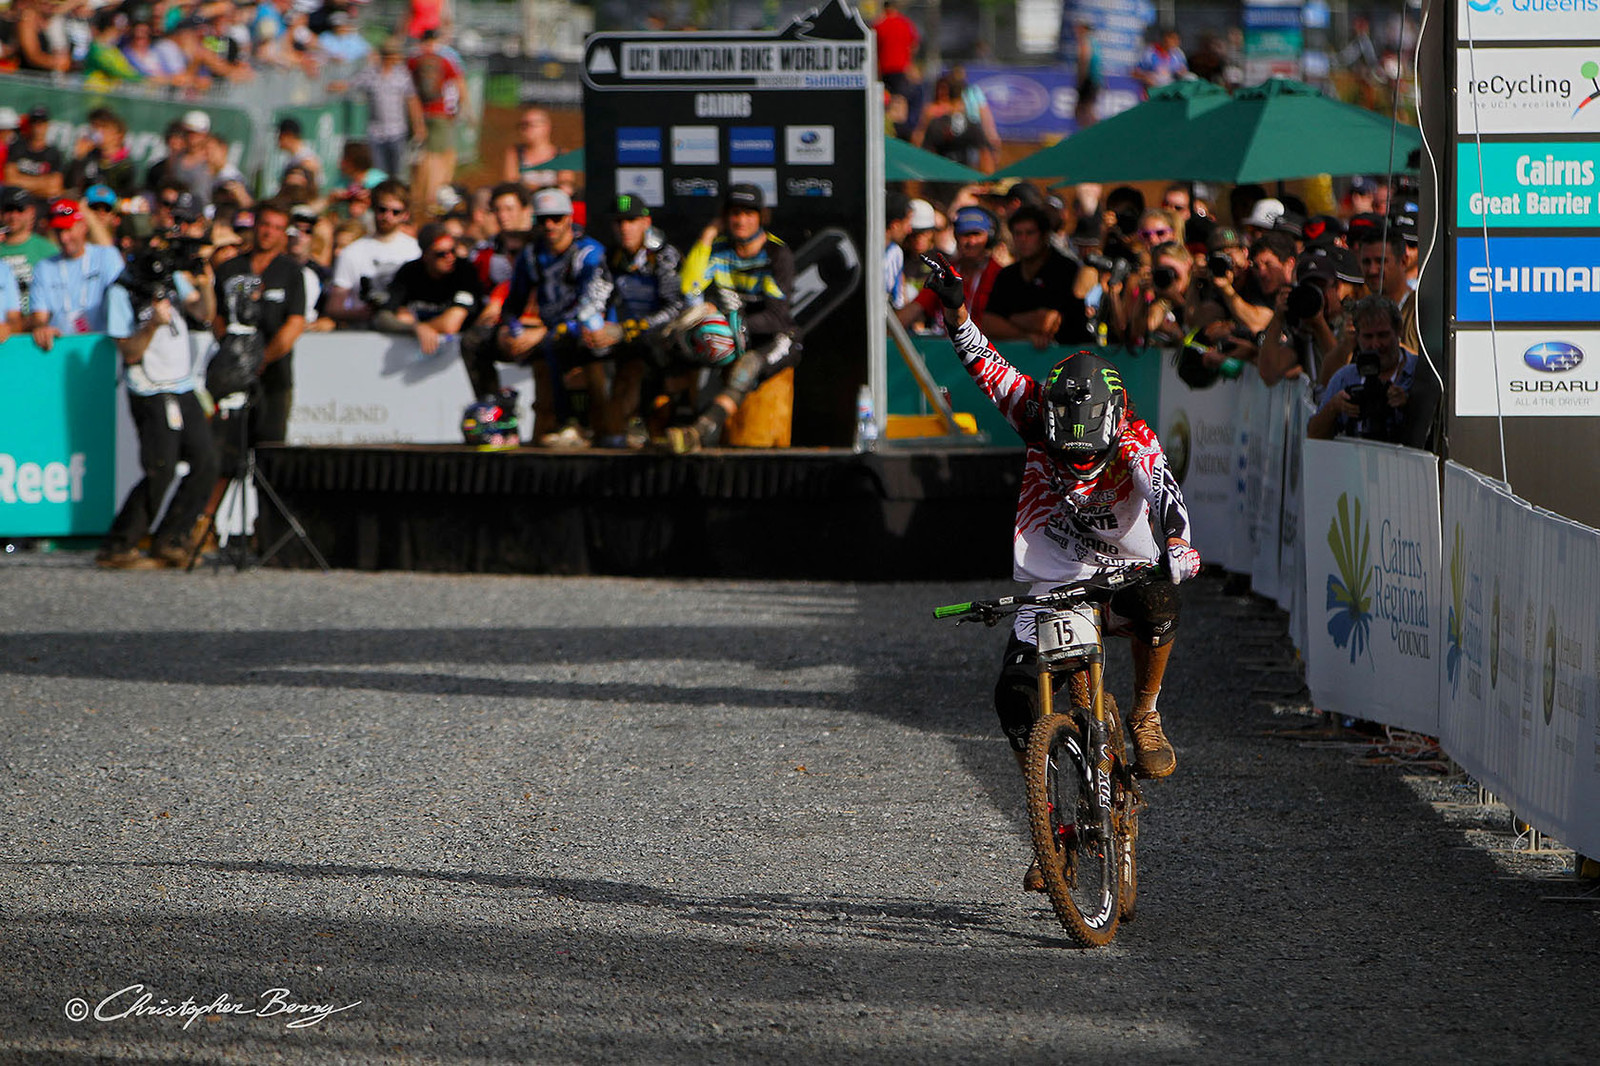 Josh Bryceland - ombei - Mountain Biking Pictures - Vital MTB